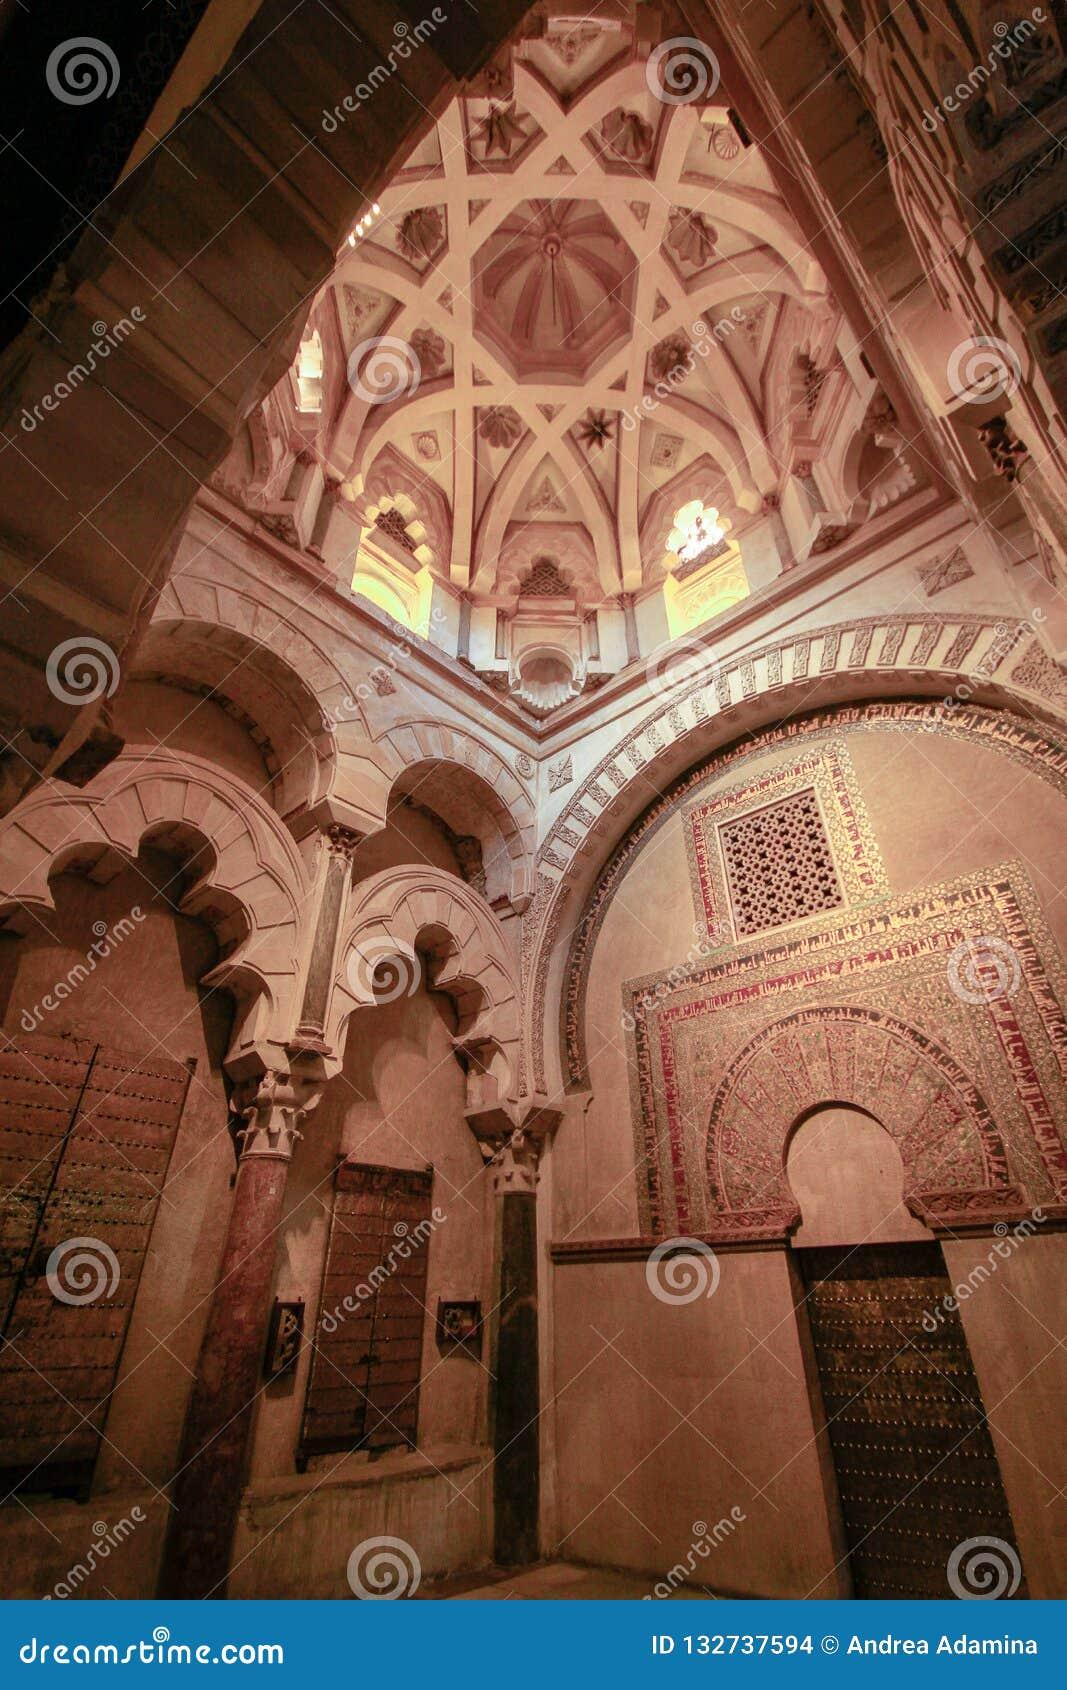 El interior de la capilla de Villaviciosa en la mezquita Mezquita del Mesquite en Córdoba España Andalucía